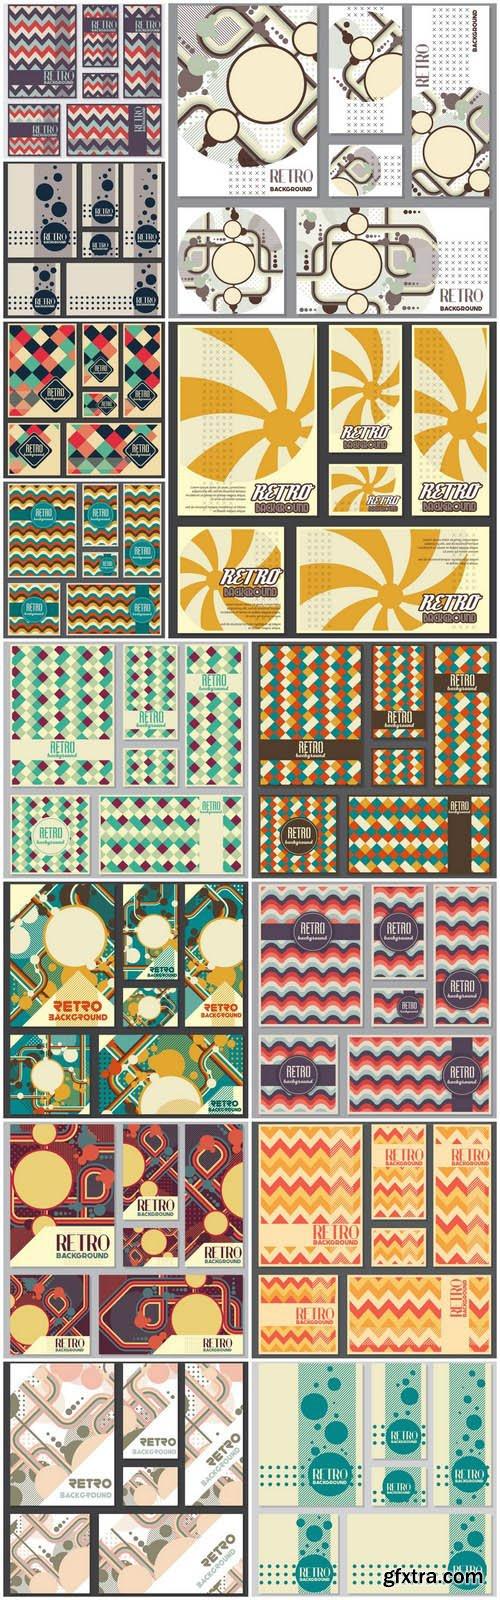 Retro Vintage Card Banners - 15 Vector